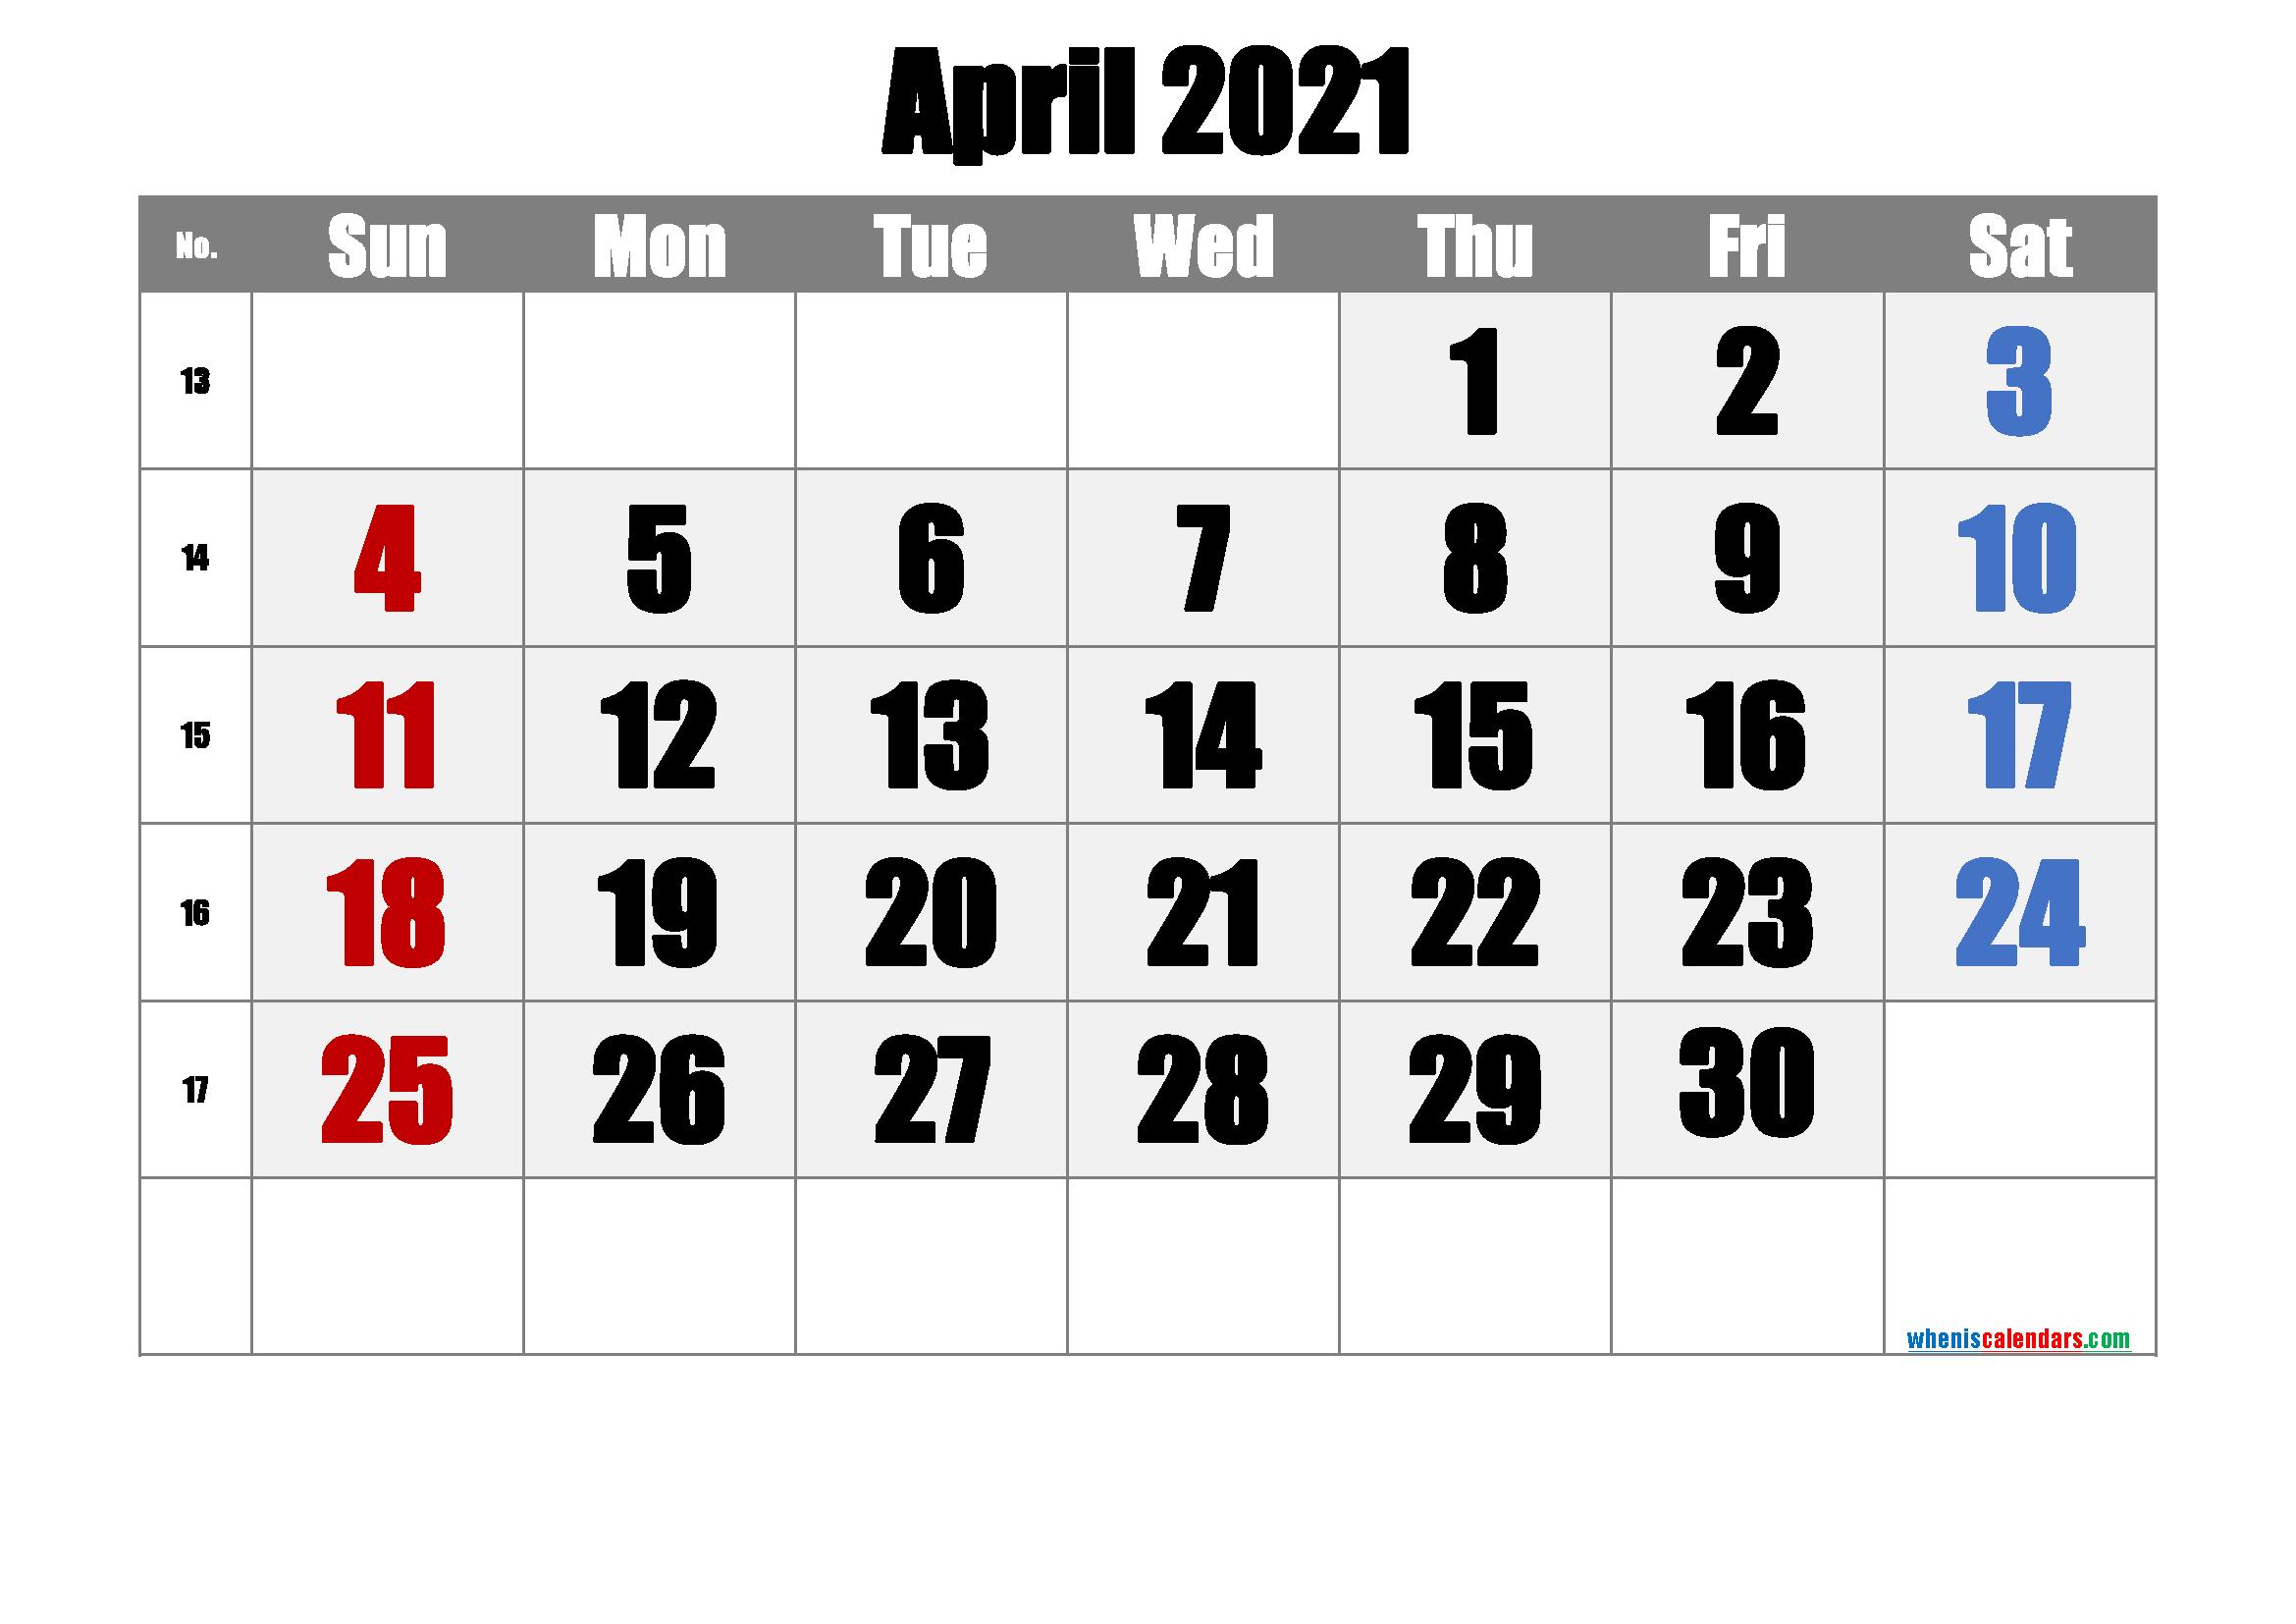 Apr 2021 Calendar Free Printable